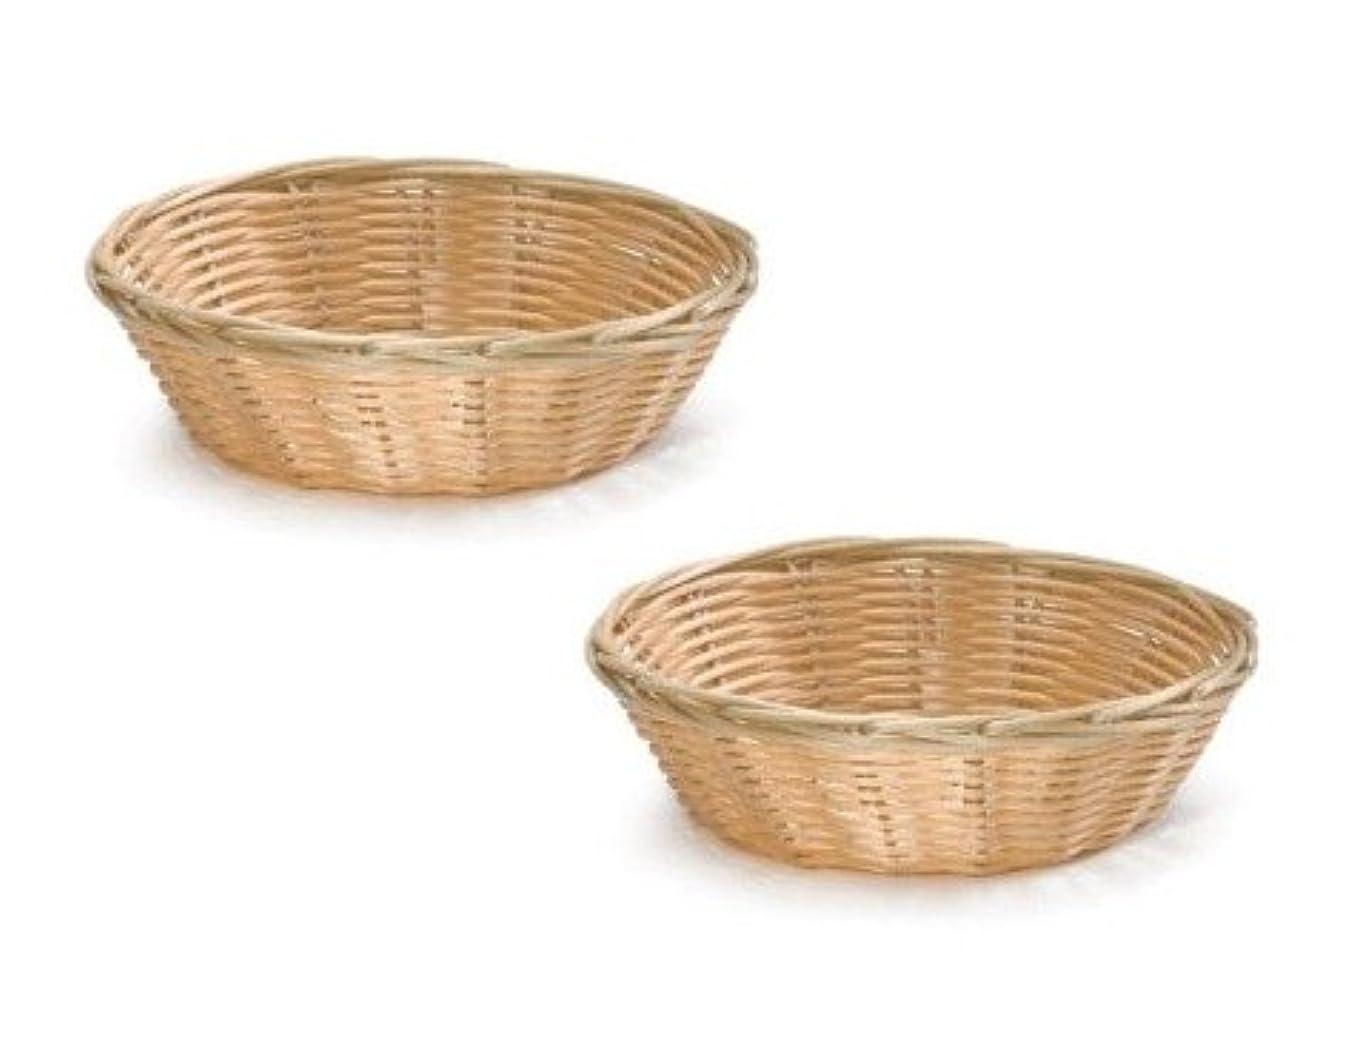 8-Inch Round Woven Bread Roll Baskets, Food Serving Baskets, Basket, Restaurant Quality, Polypropylene Material - Set of 2